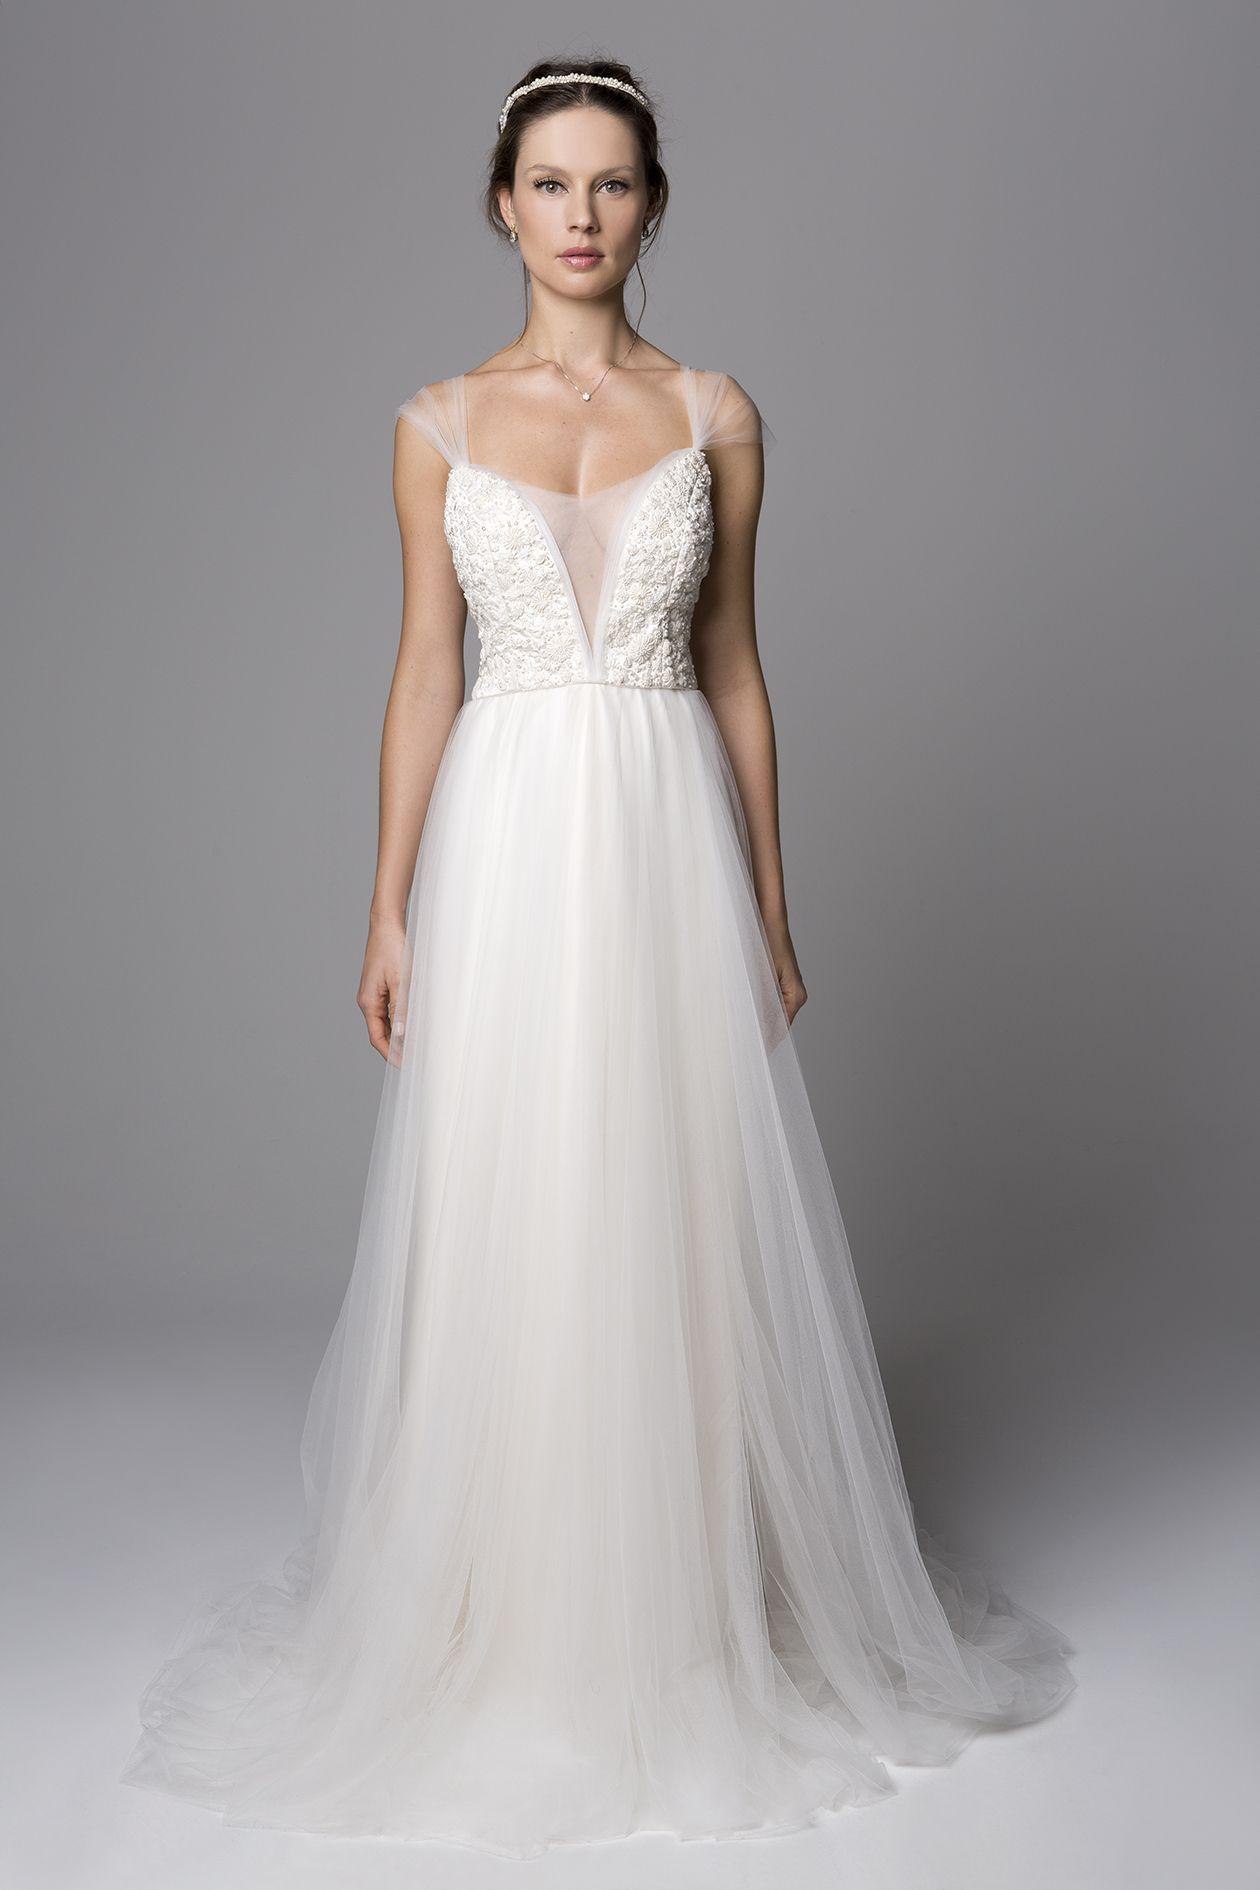 8474d3304 Vestido de noiva - Nouveau por Giselle Nasser: Vestido Brida em tule e  cetim de seda bordado. Noiva romântica, casamento no campo, casamento  rústico, ...